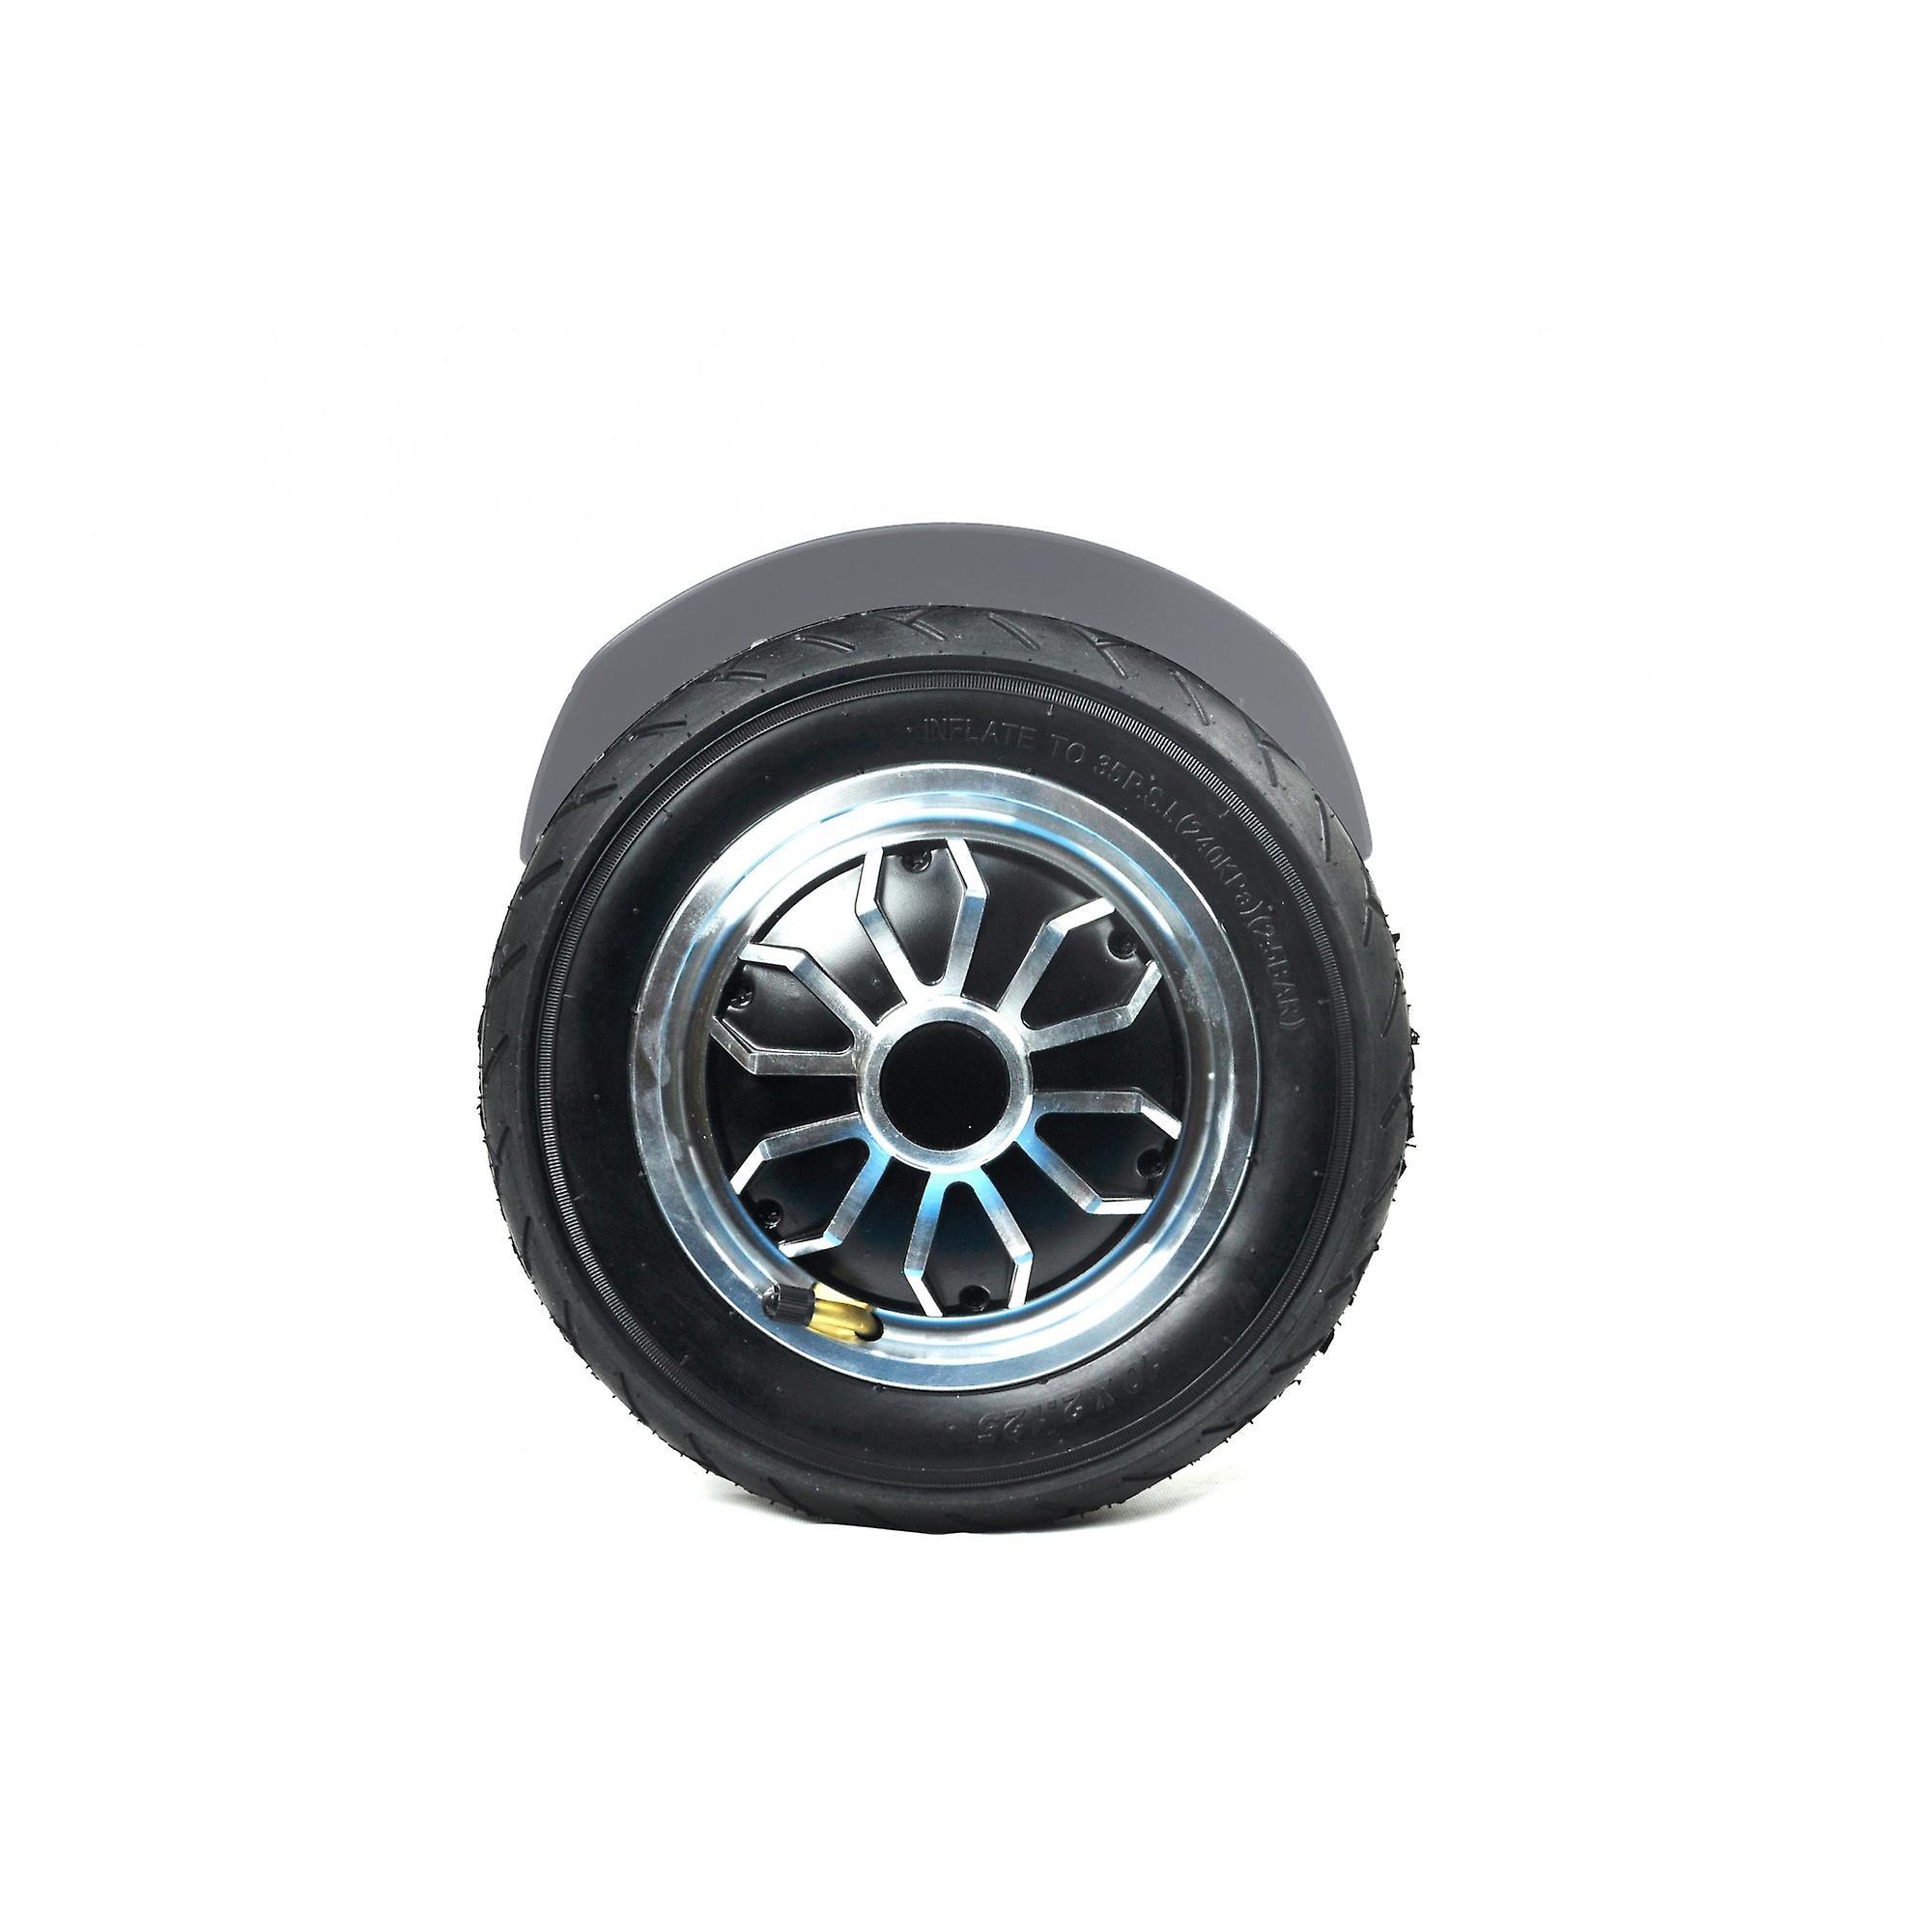 Hoverboard Skateflash K10n Silver Grey